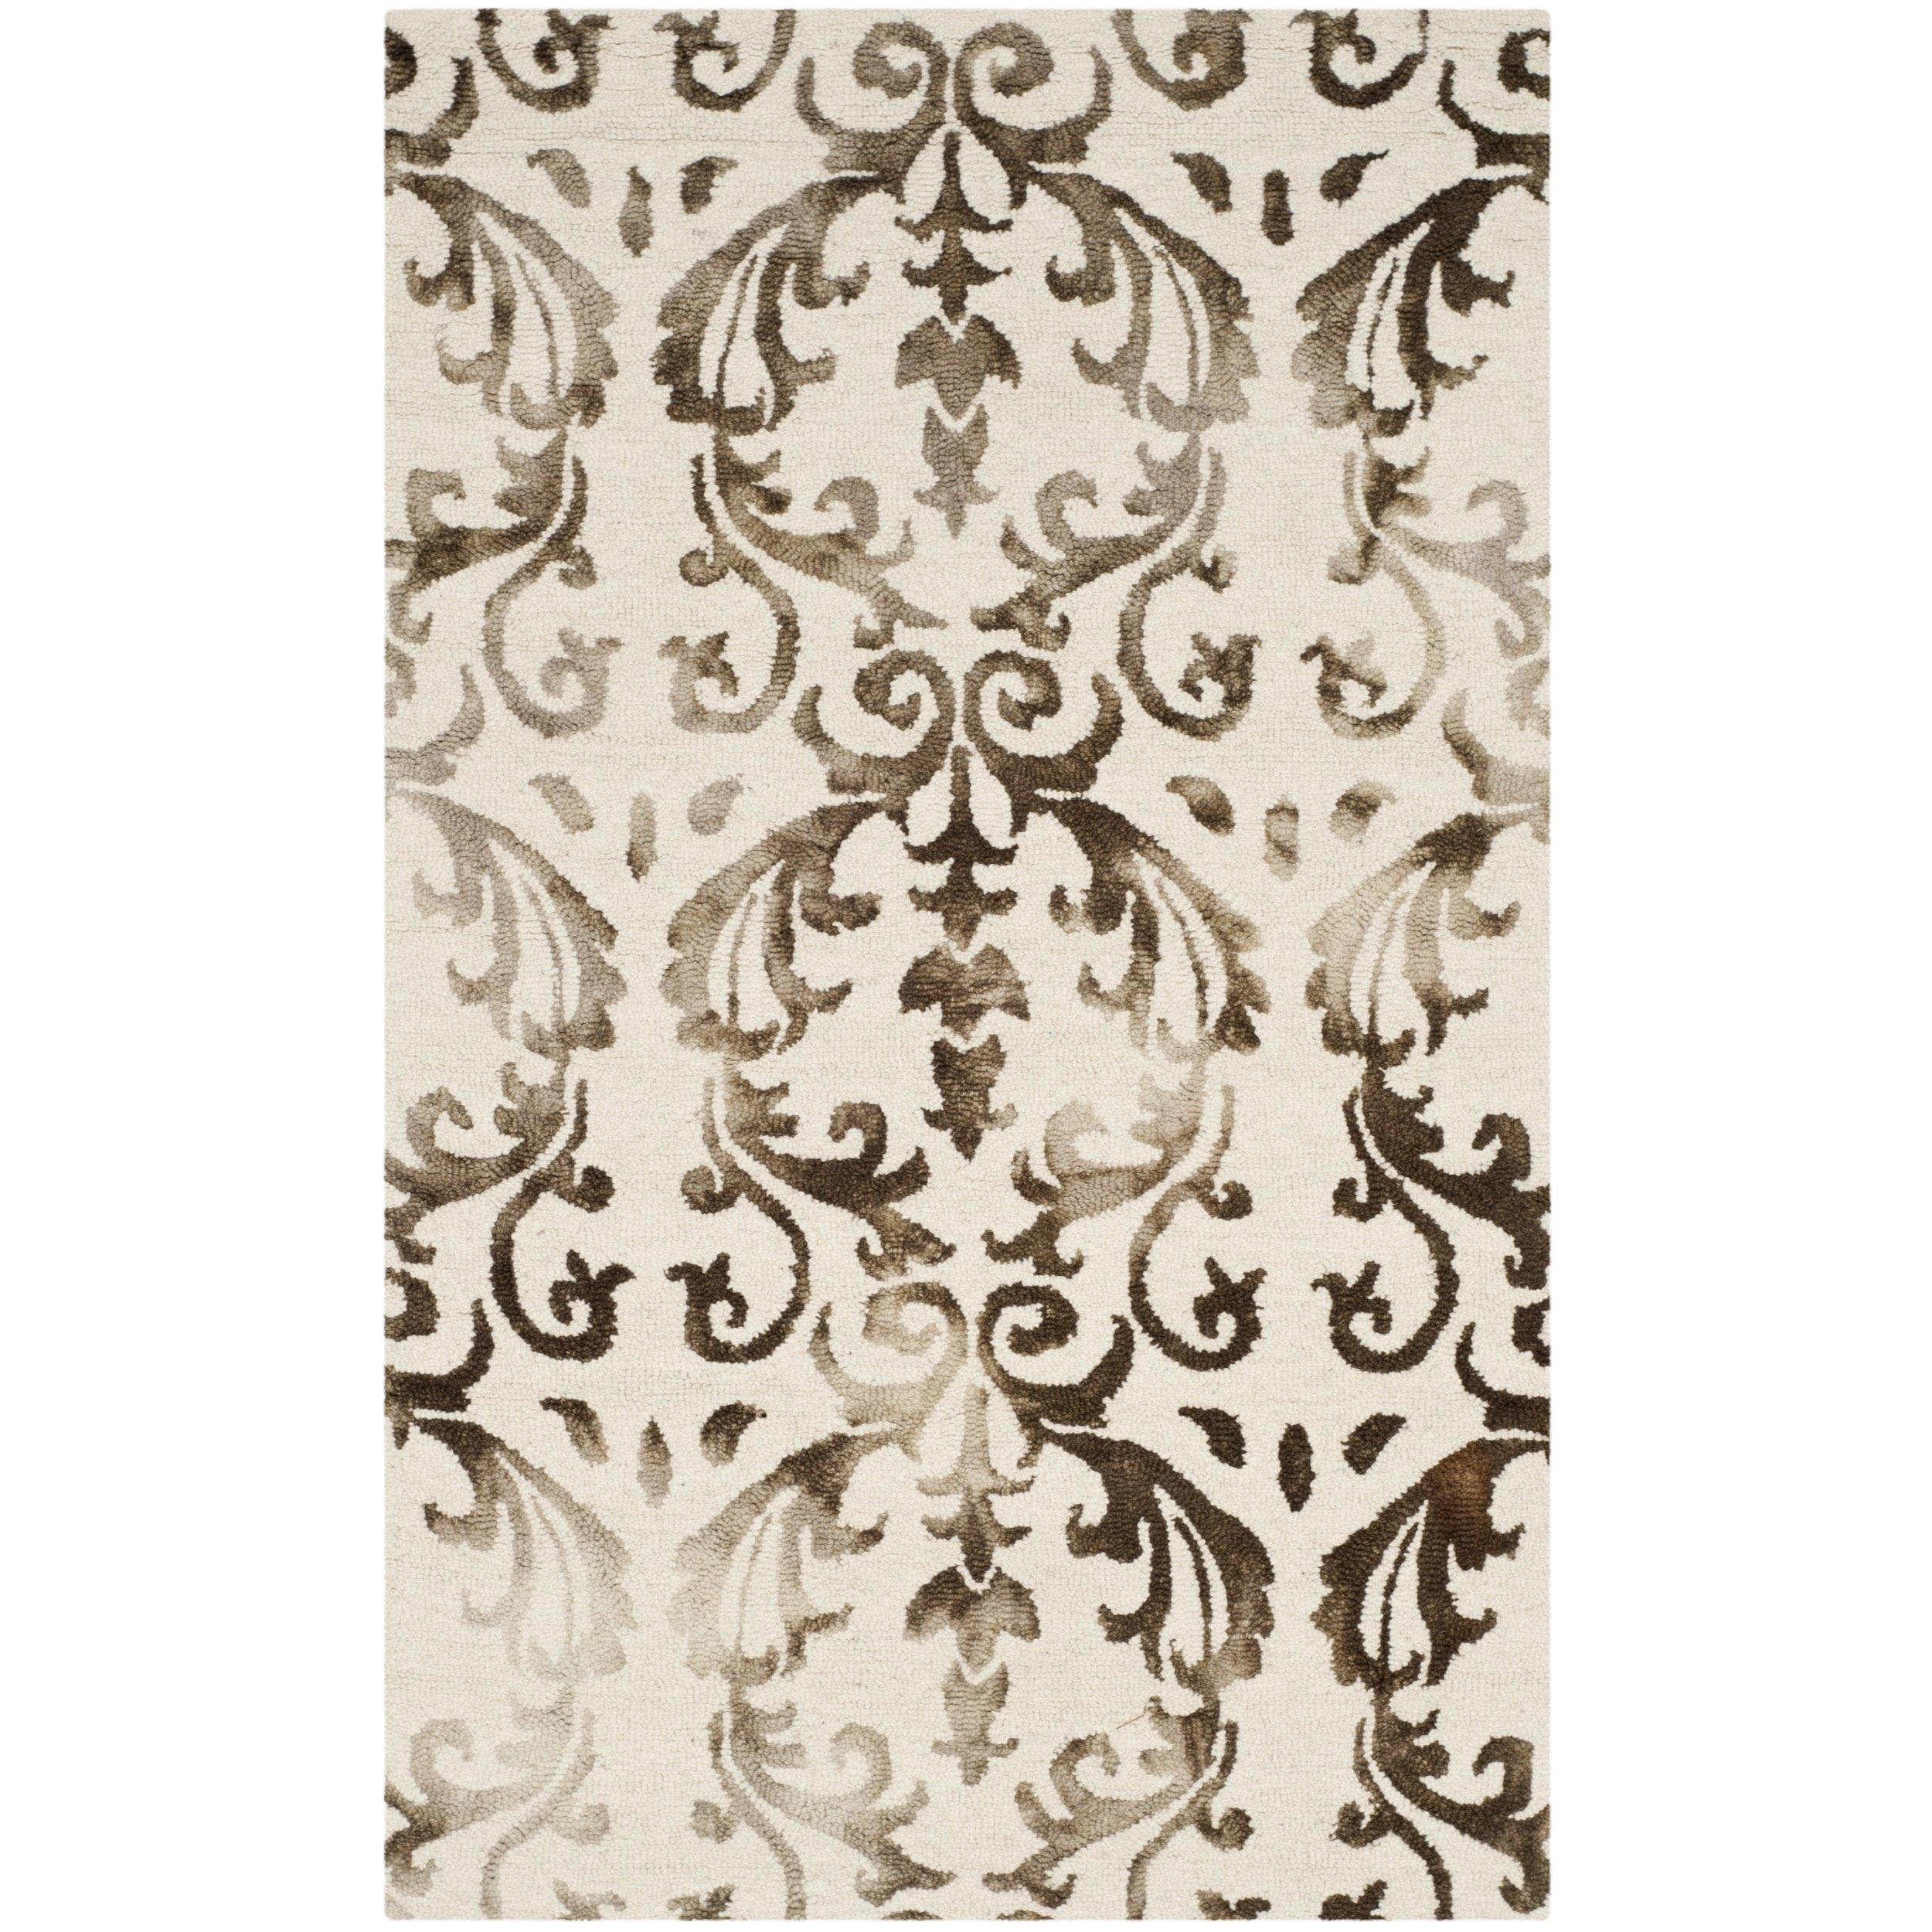 Safavieh Dip Dye Collection DDY689B Handmade Geometric Watercolor Ivory and Chocolate Wool Area Rug (3' x 5')